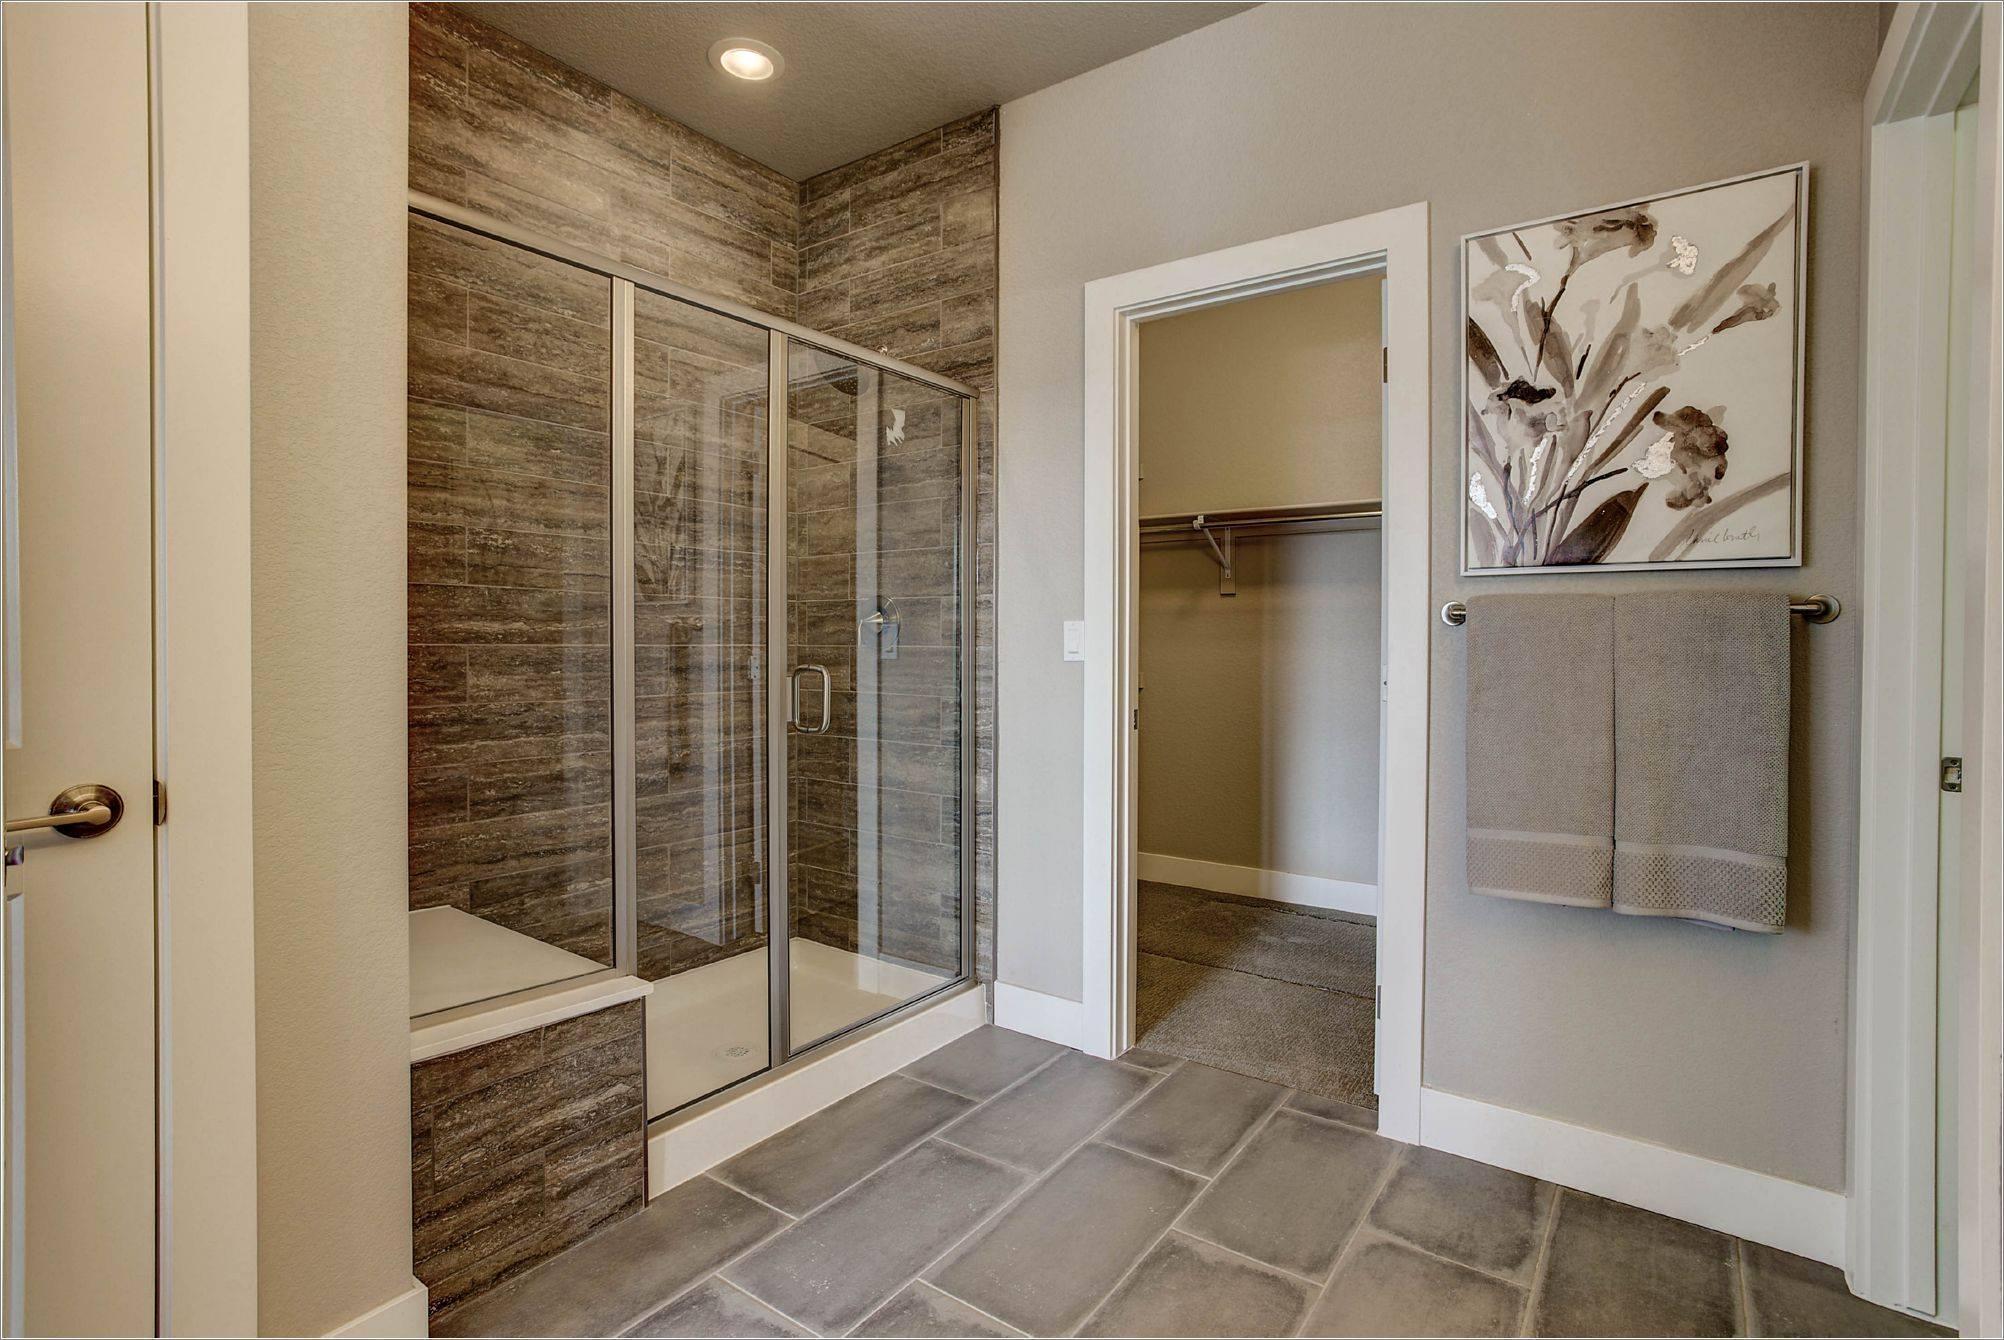 Bathroom featured in the Fairway Villa II By Koelbel at Grand Elk in Boulder-Longmont, CO